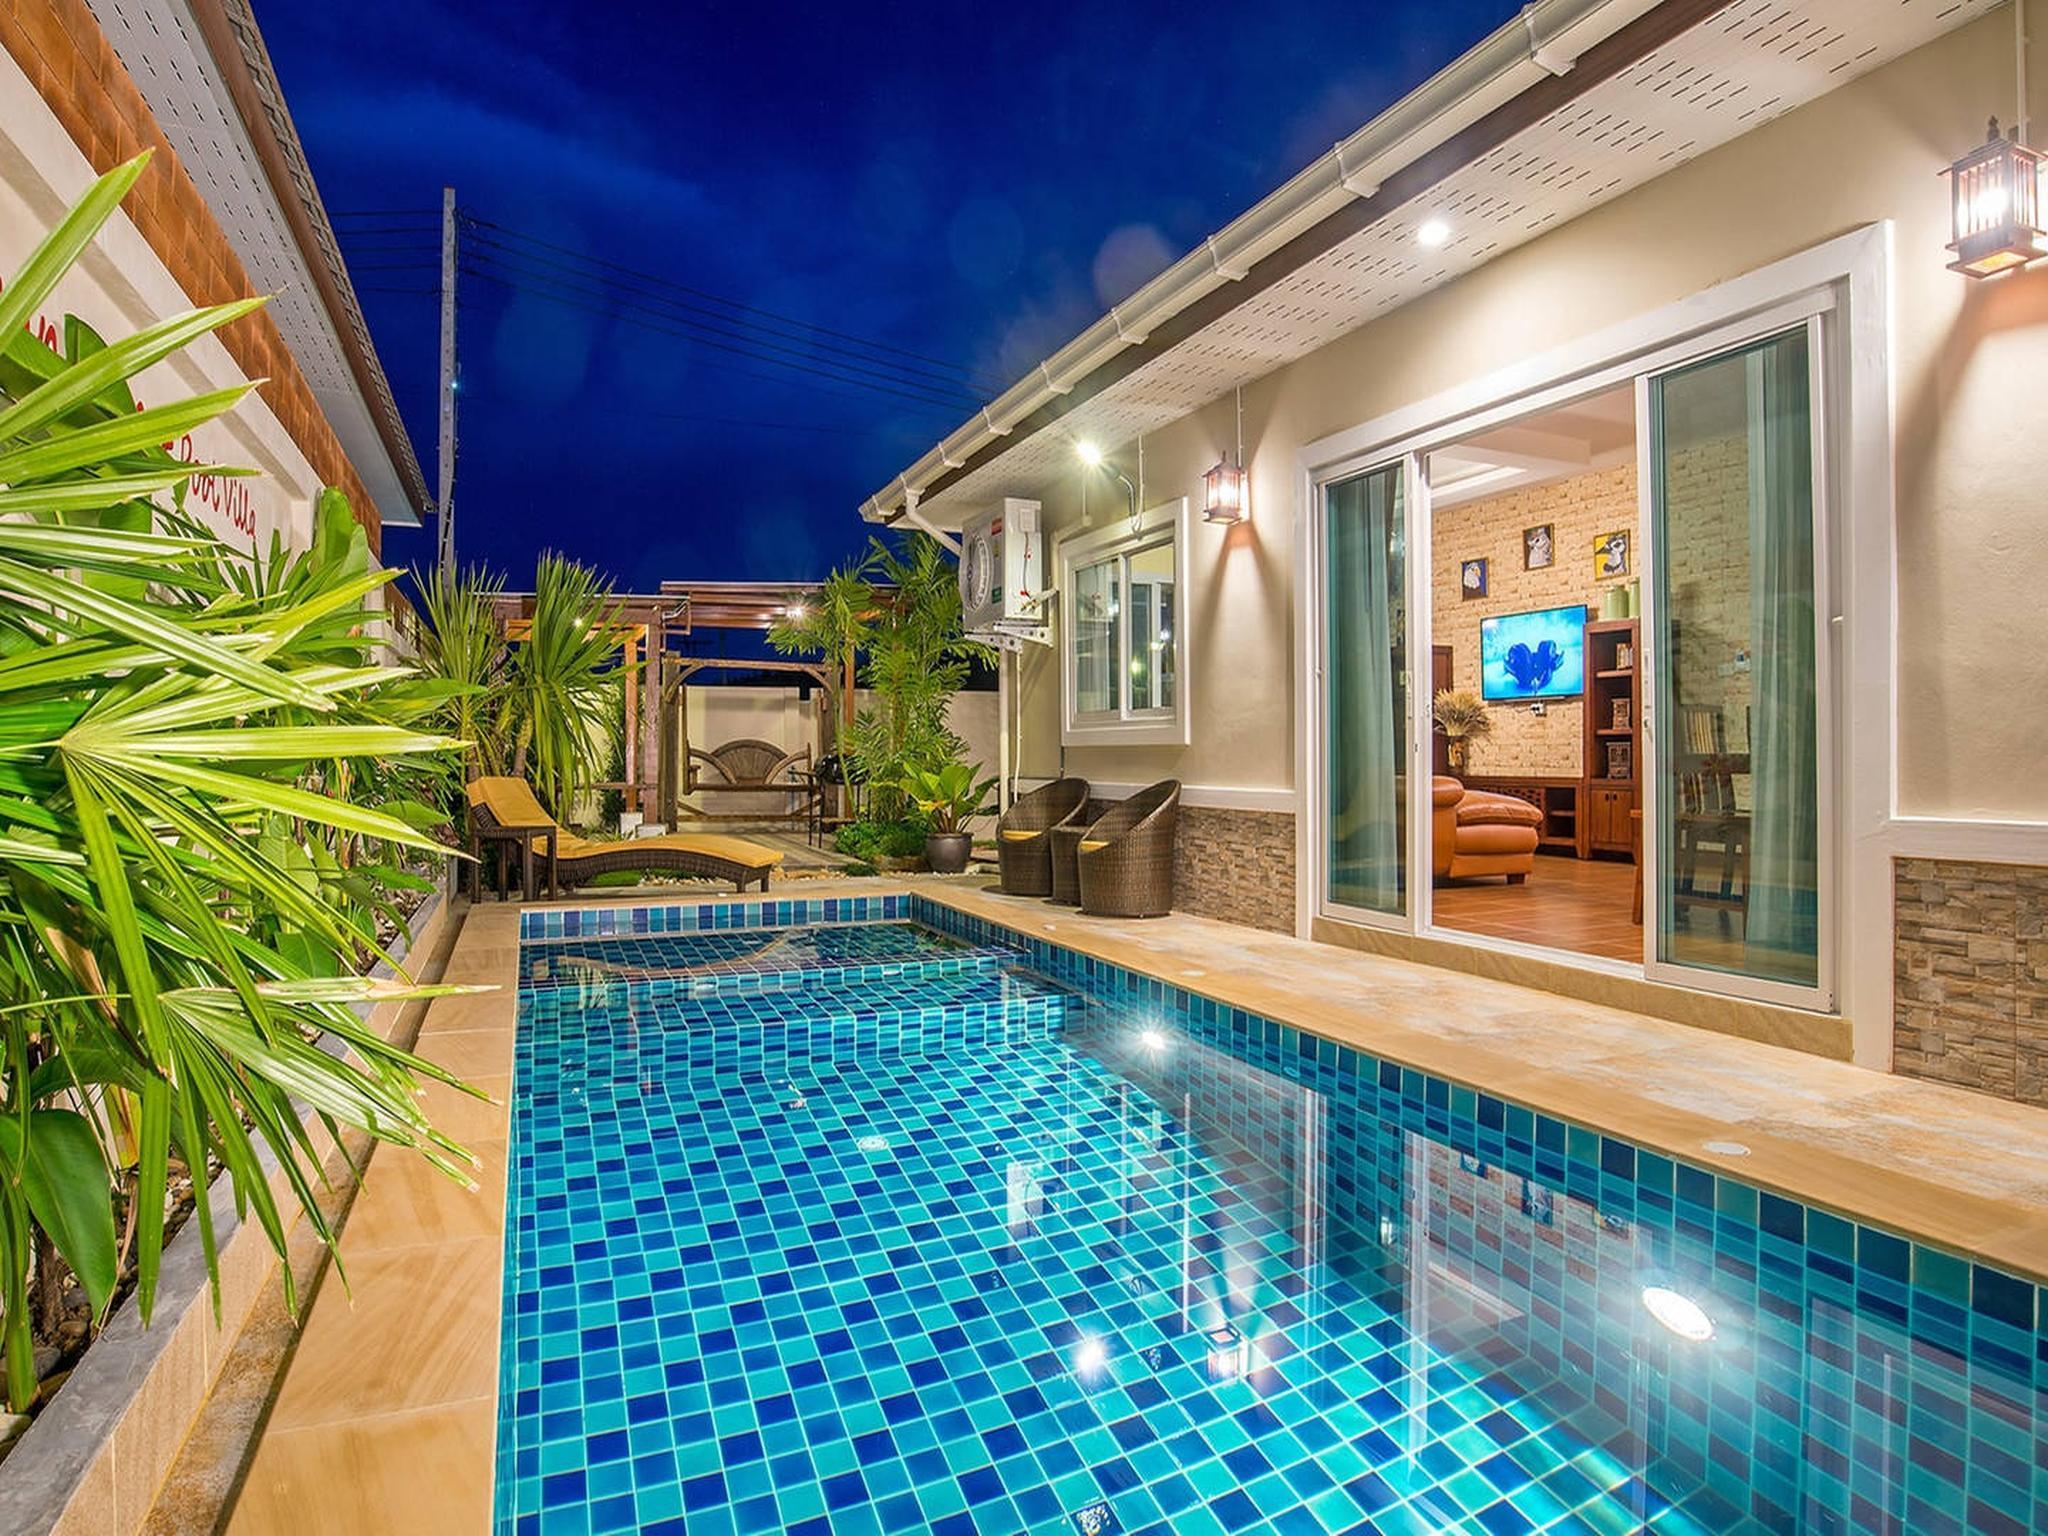 Aonang sweet pool villa Aonang sweet pool villa